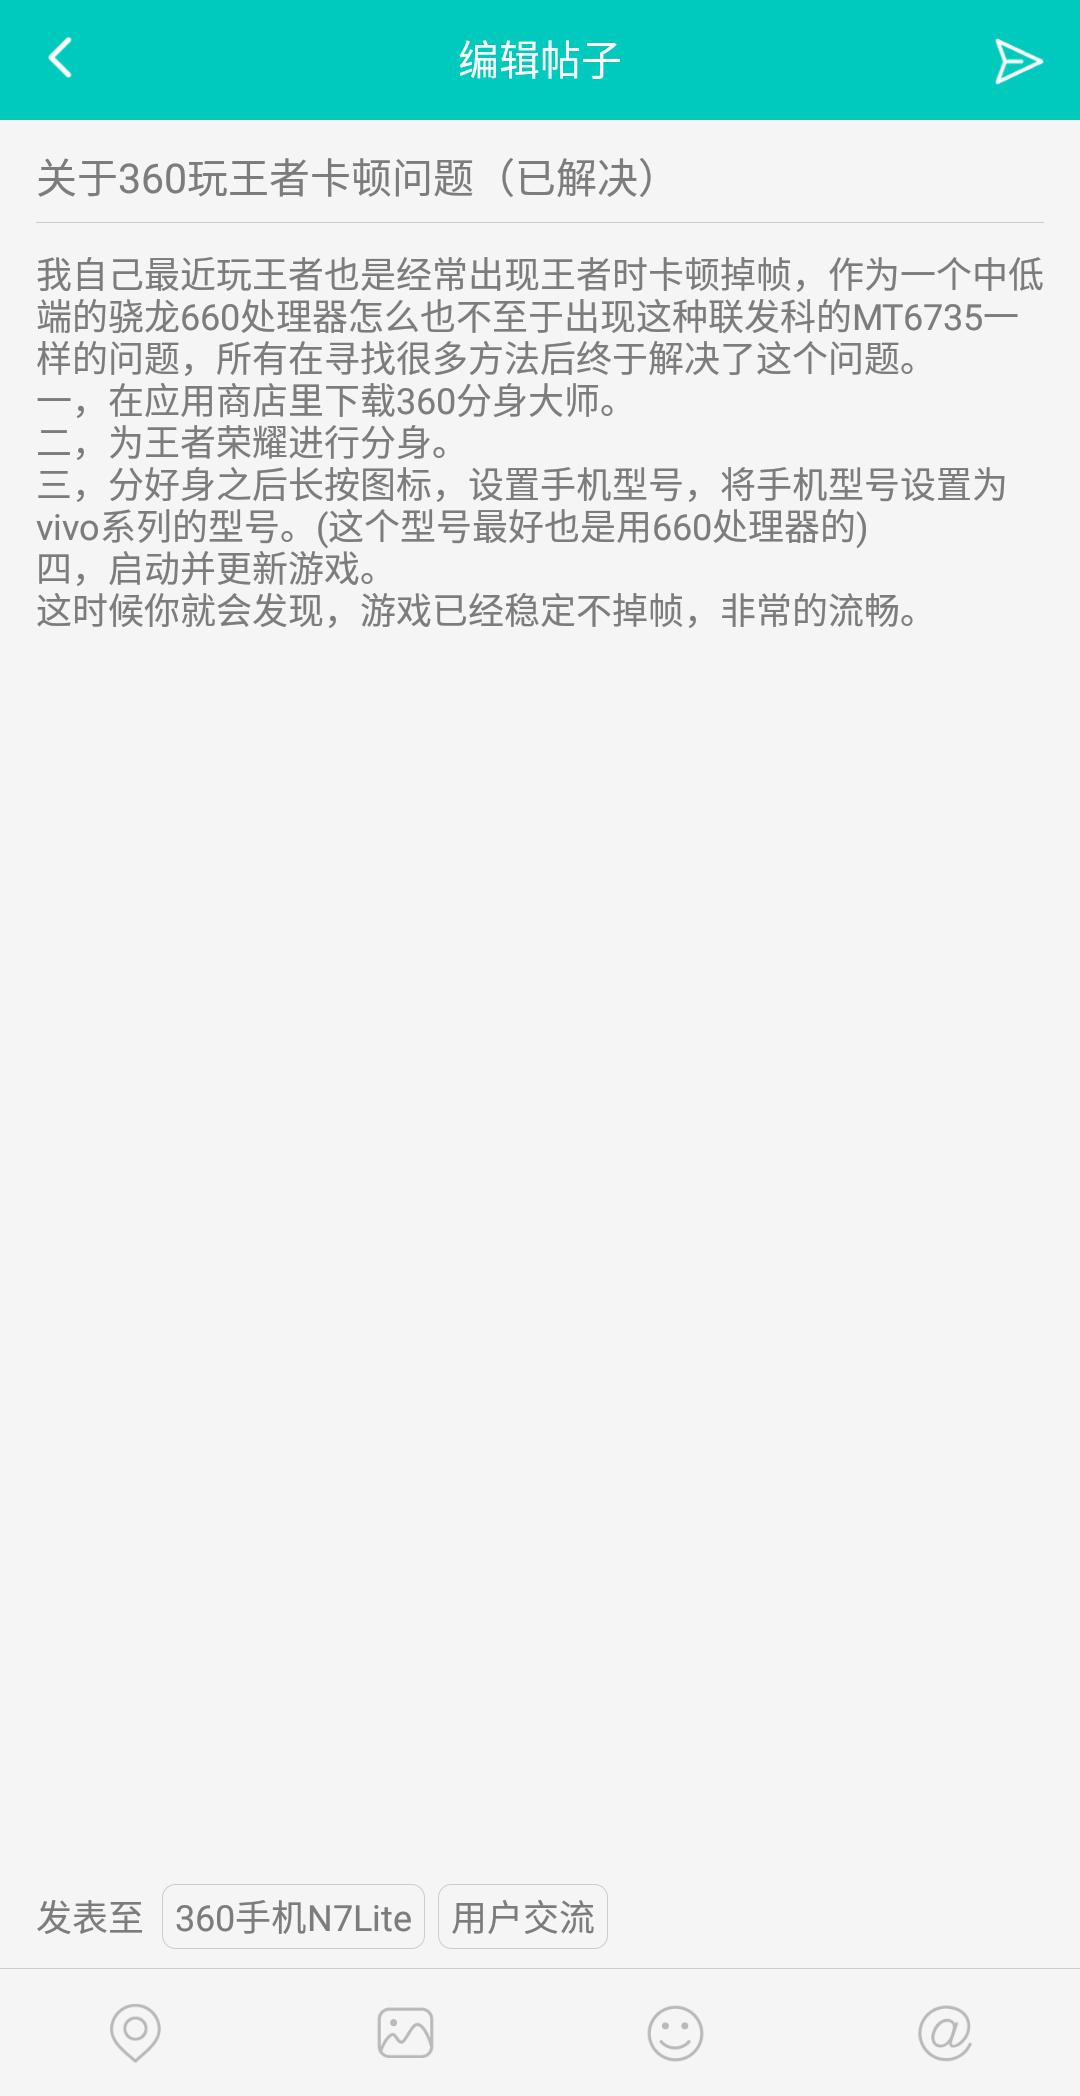 Screenshot_2020-05-06-01-05-02.png